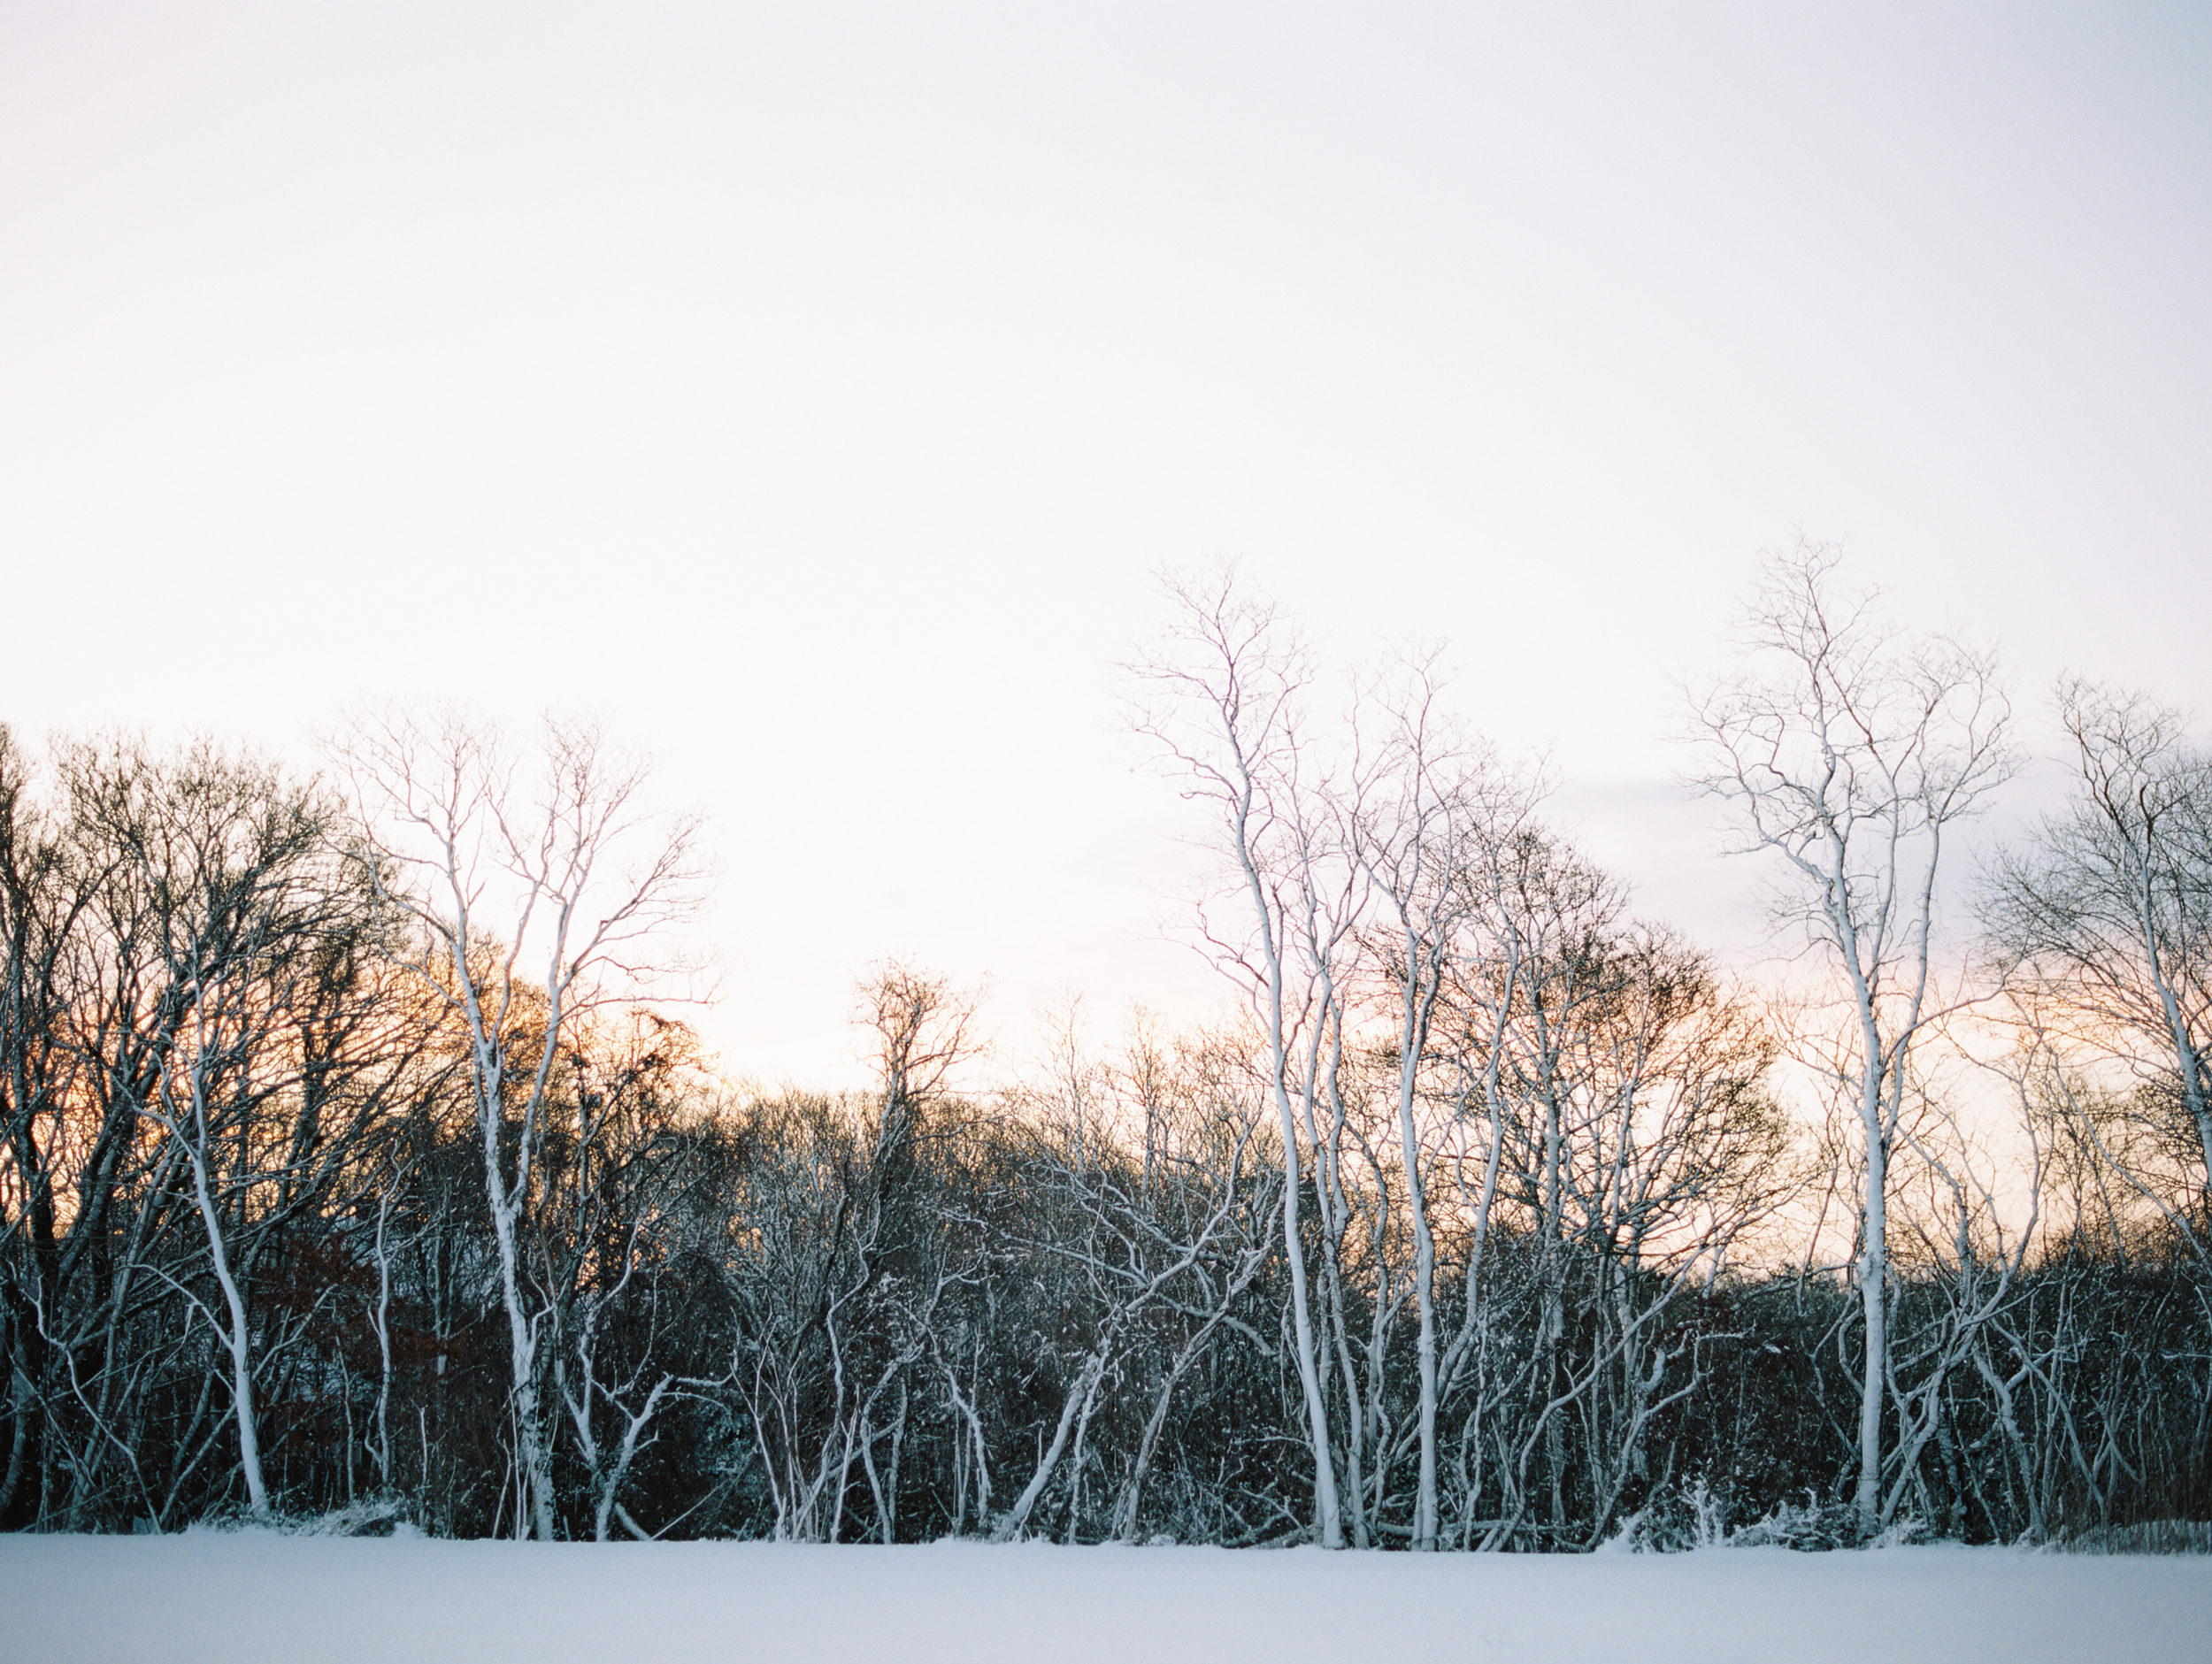 014-fine-art-photography-le-petite-peach-cape-cod-brumley & wells.jpg